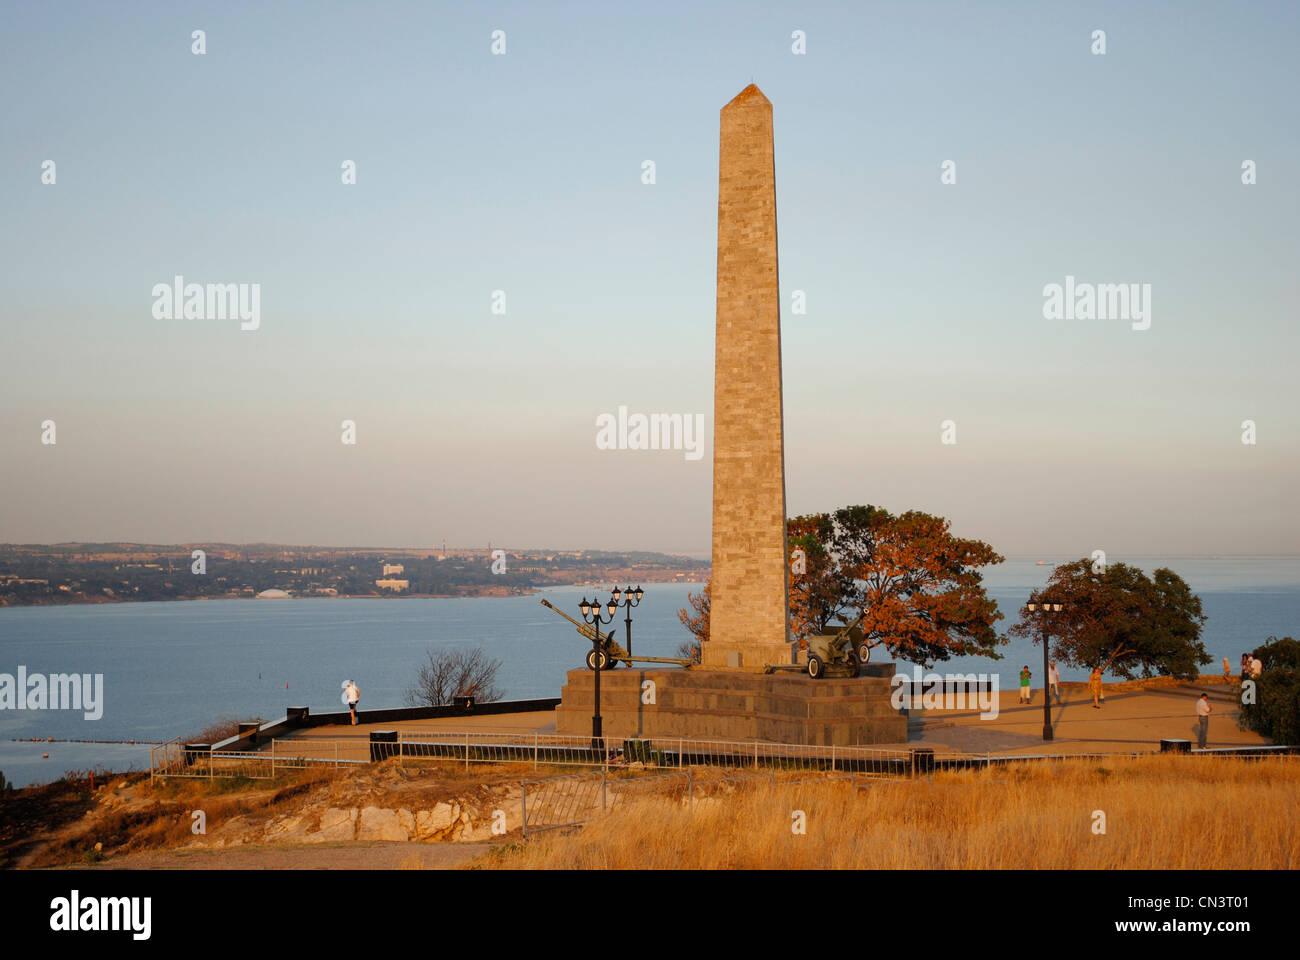 Ukraine. Crimean Peninsula. Kerch. Obelisk of Glory. Erected in 1944 and designed by Moisei Ginzburg (1892-1946). - Stock Image